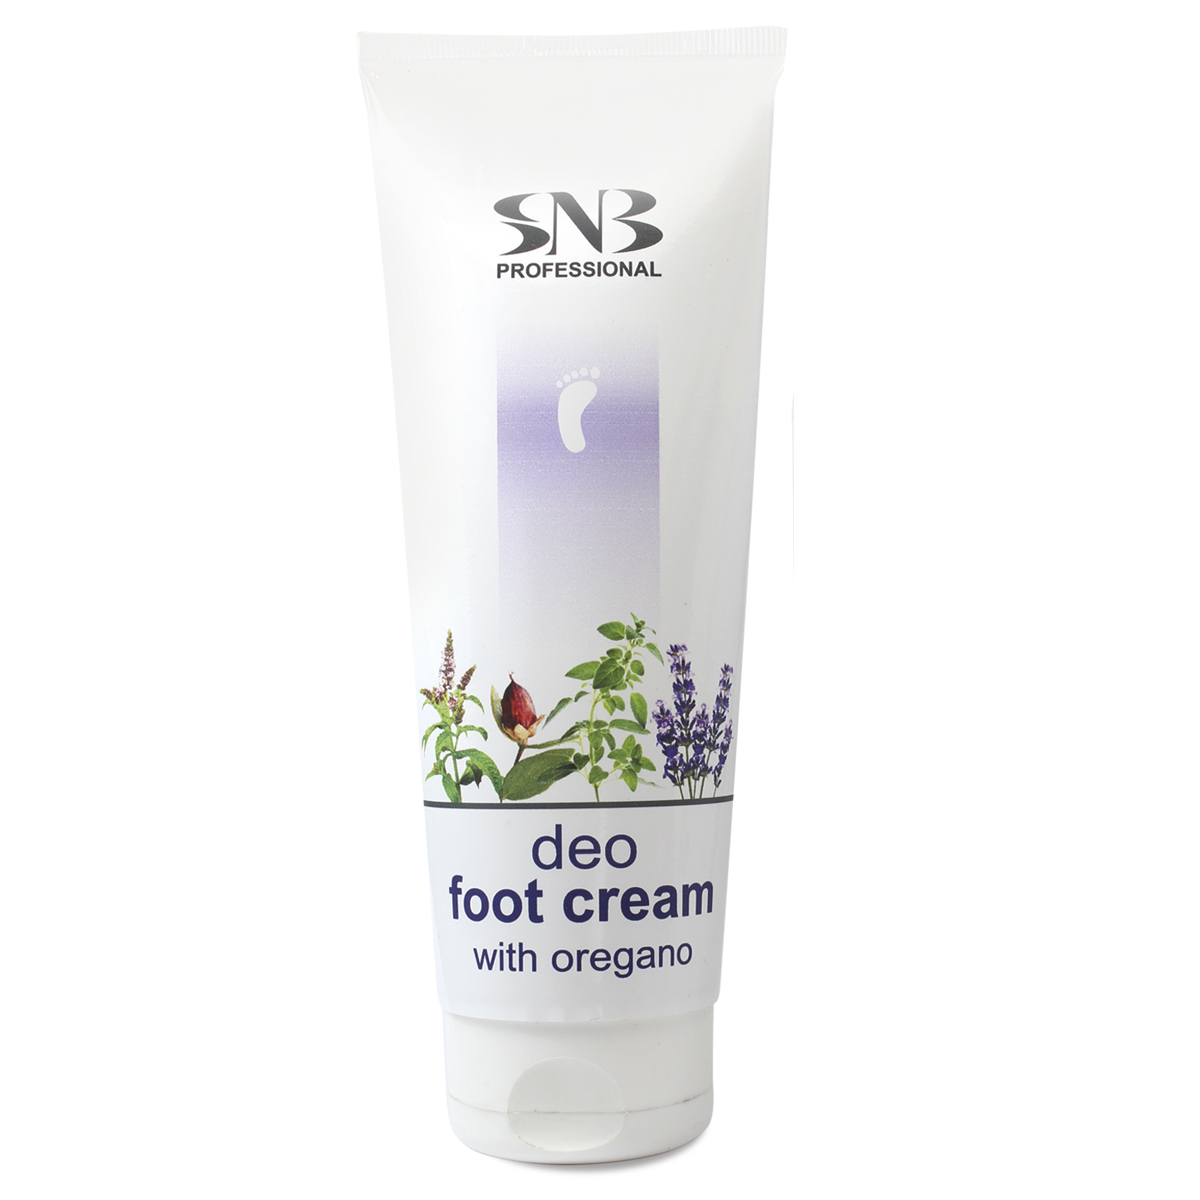 Deodorizing foot cream with oregano SNB